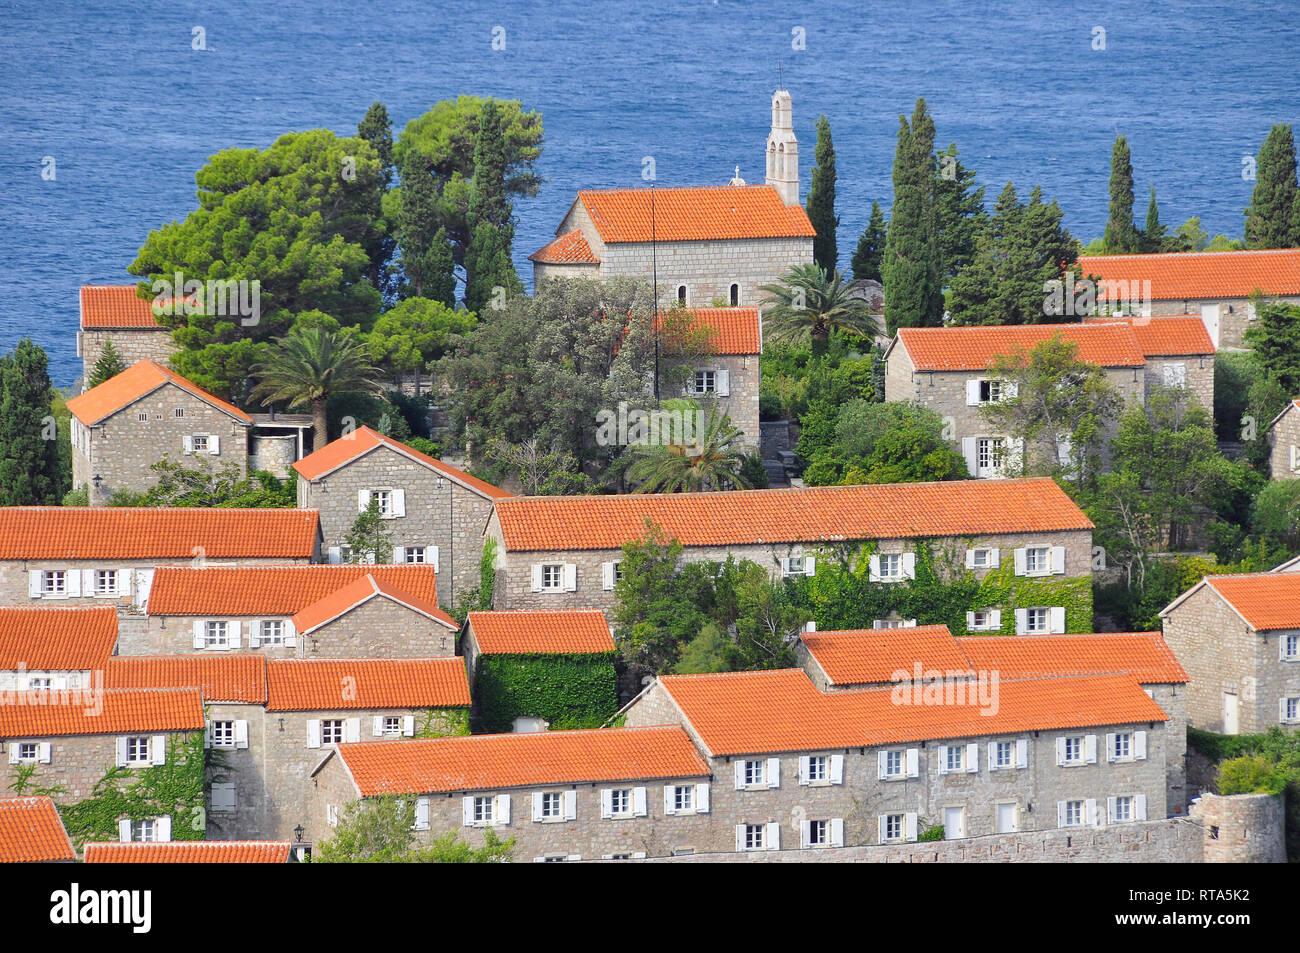 Sveti Stefan, Montenegro. - Stock Image